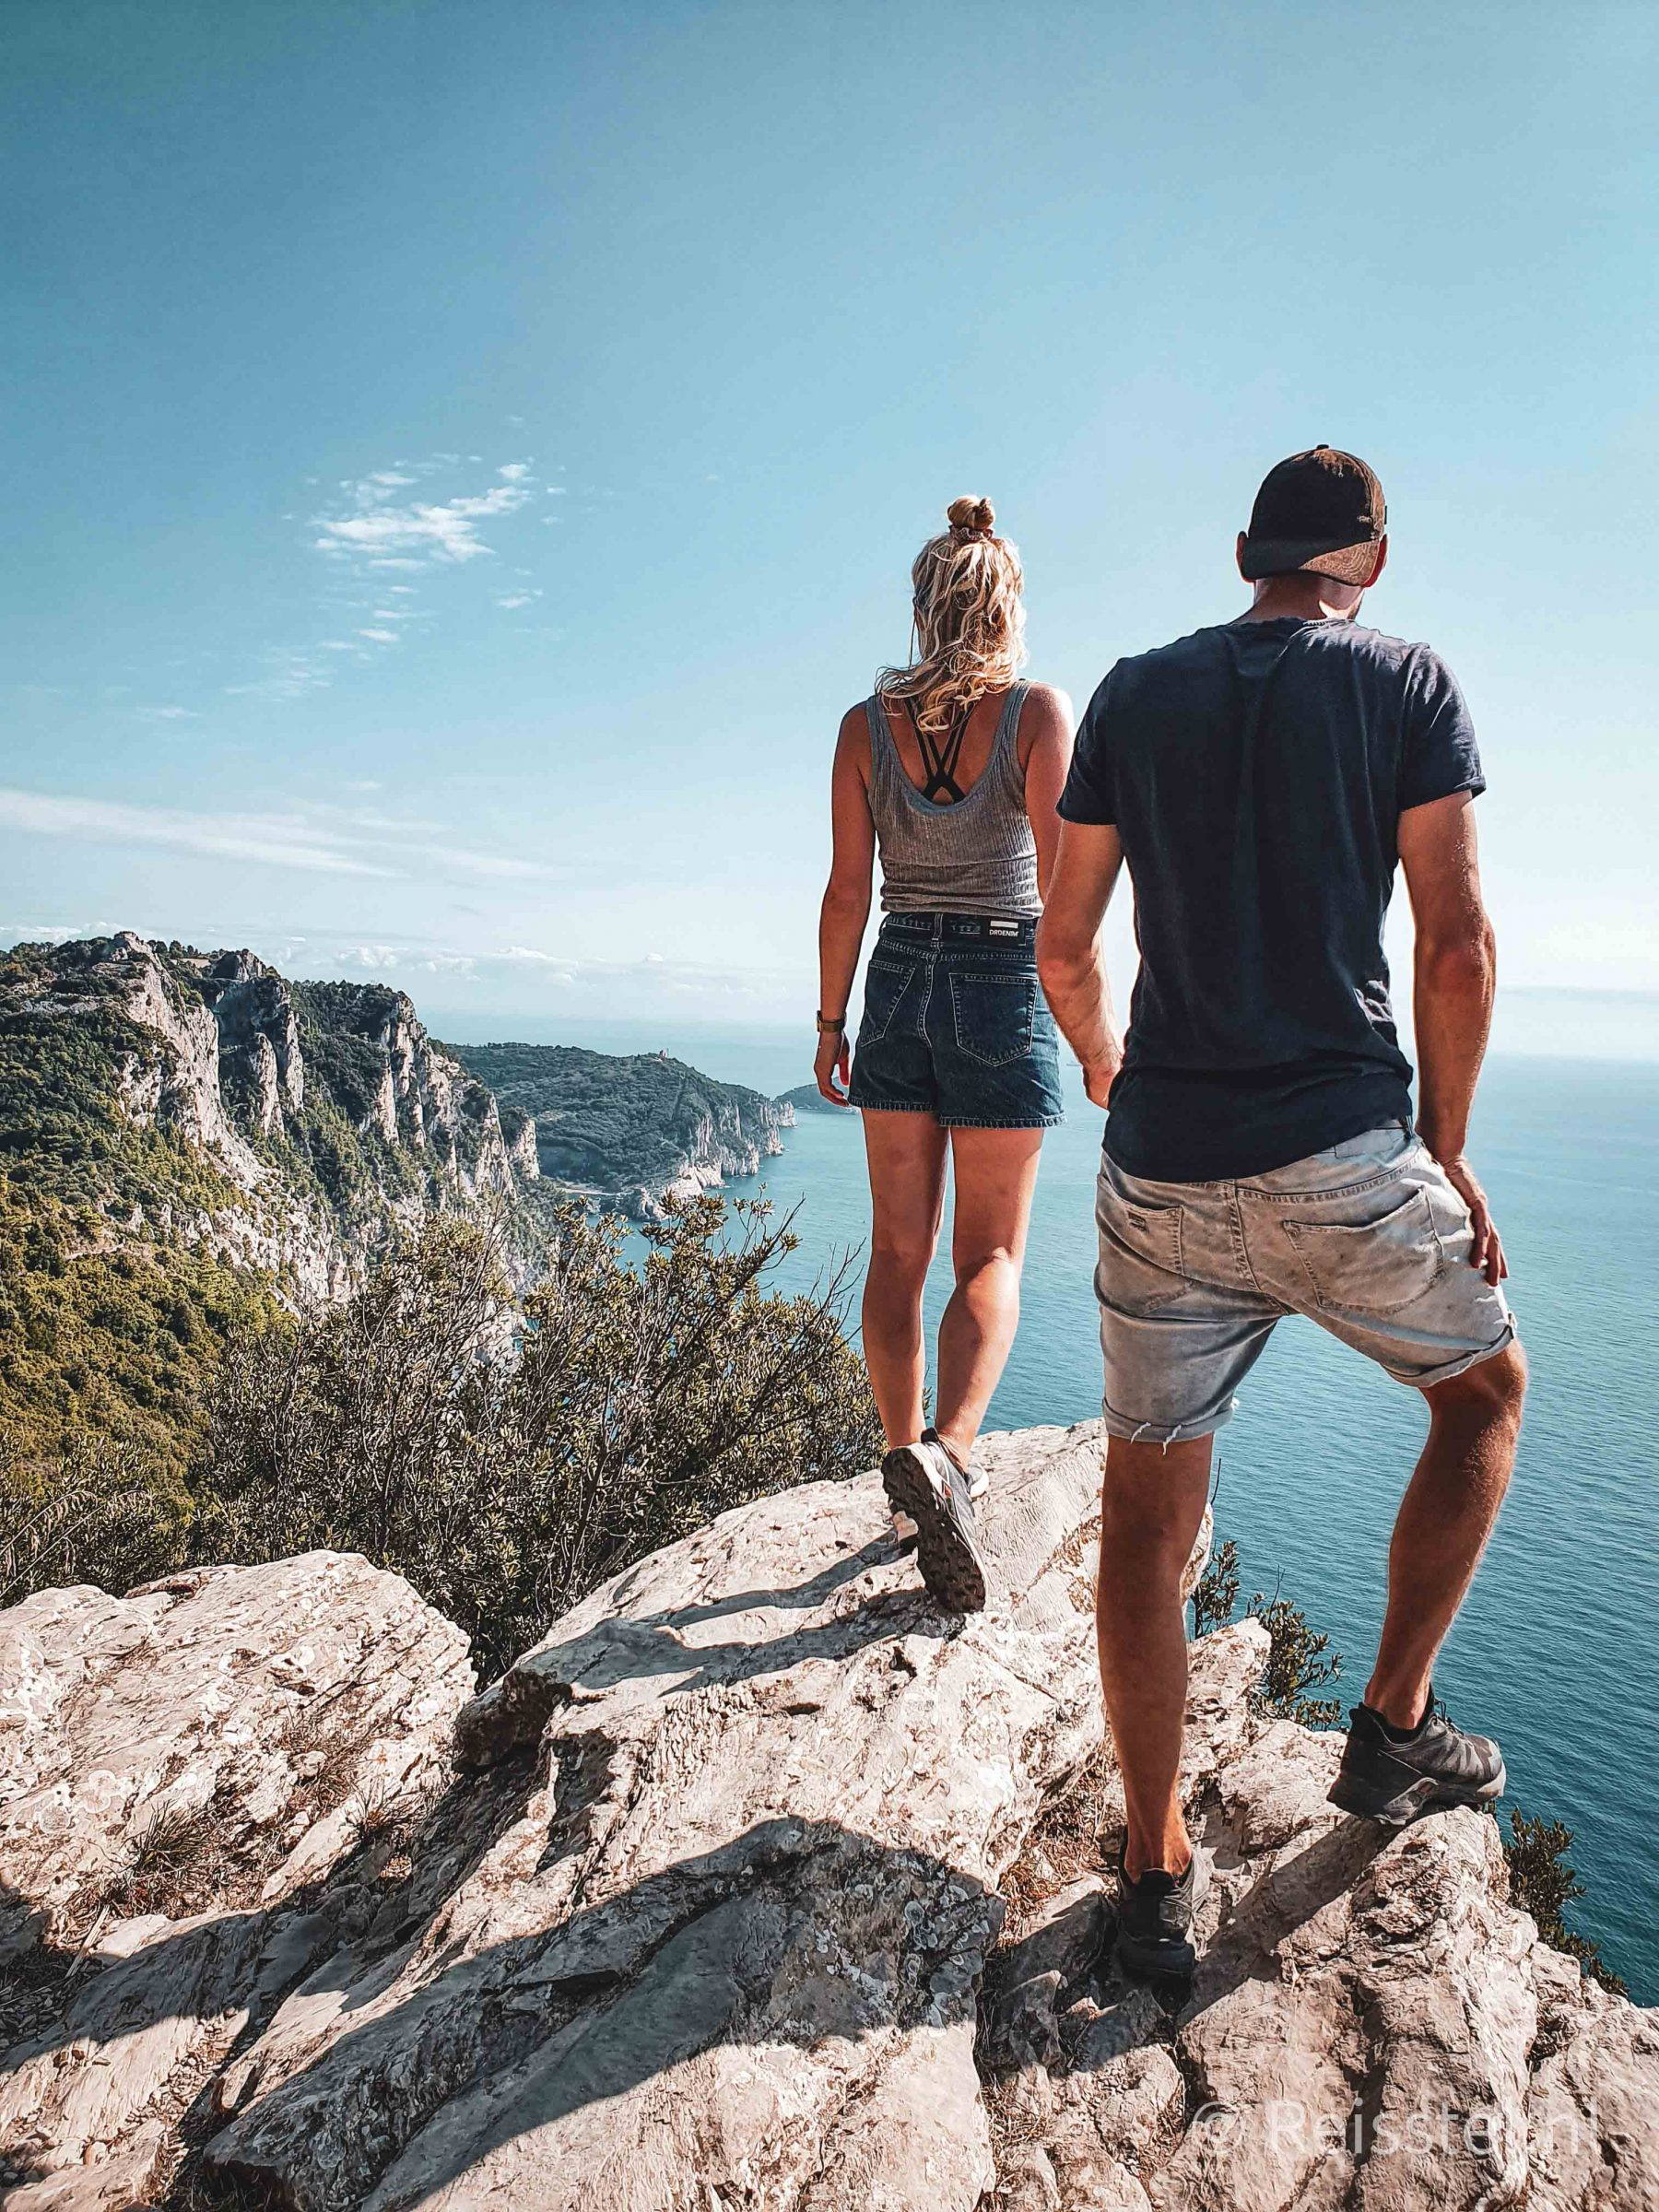 ontdek Cinque Terre | 2 daagse hike | Uitzicht hike